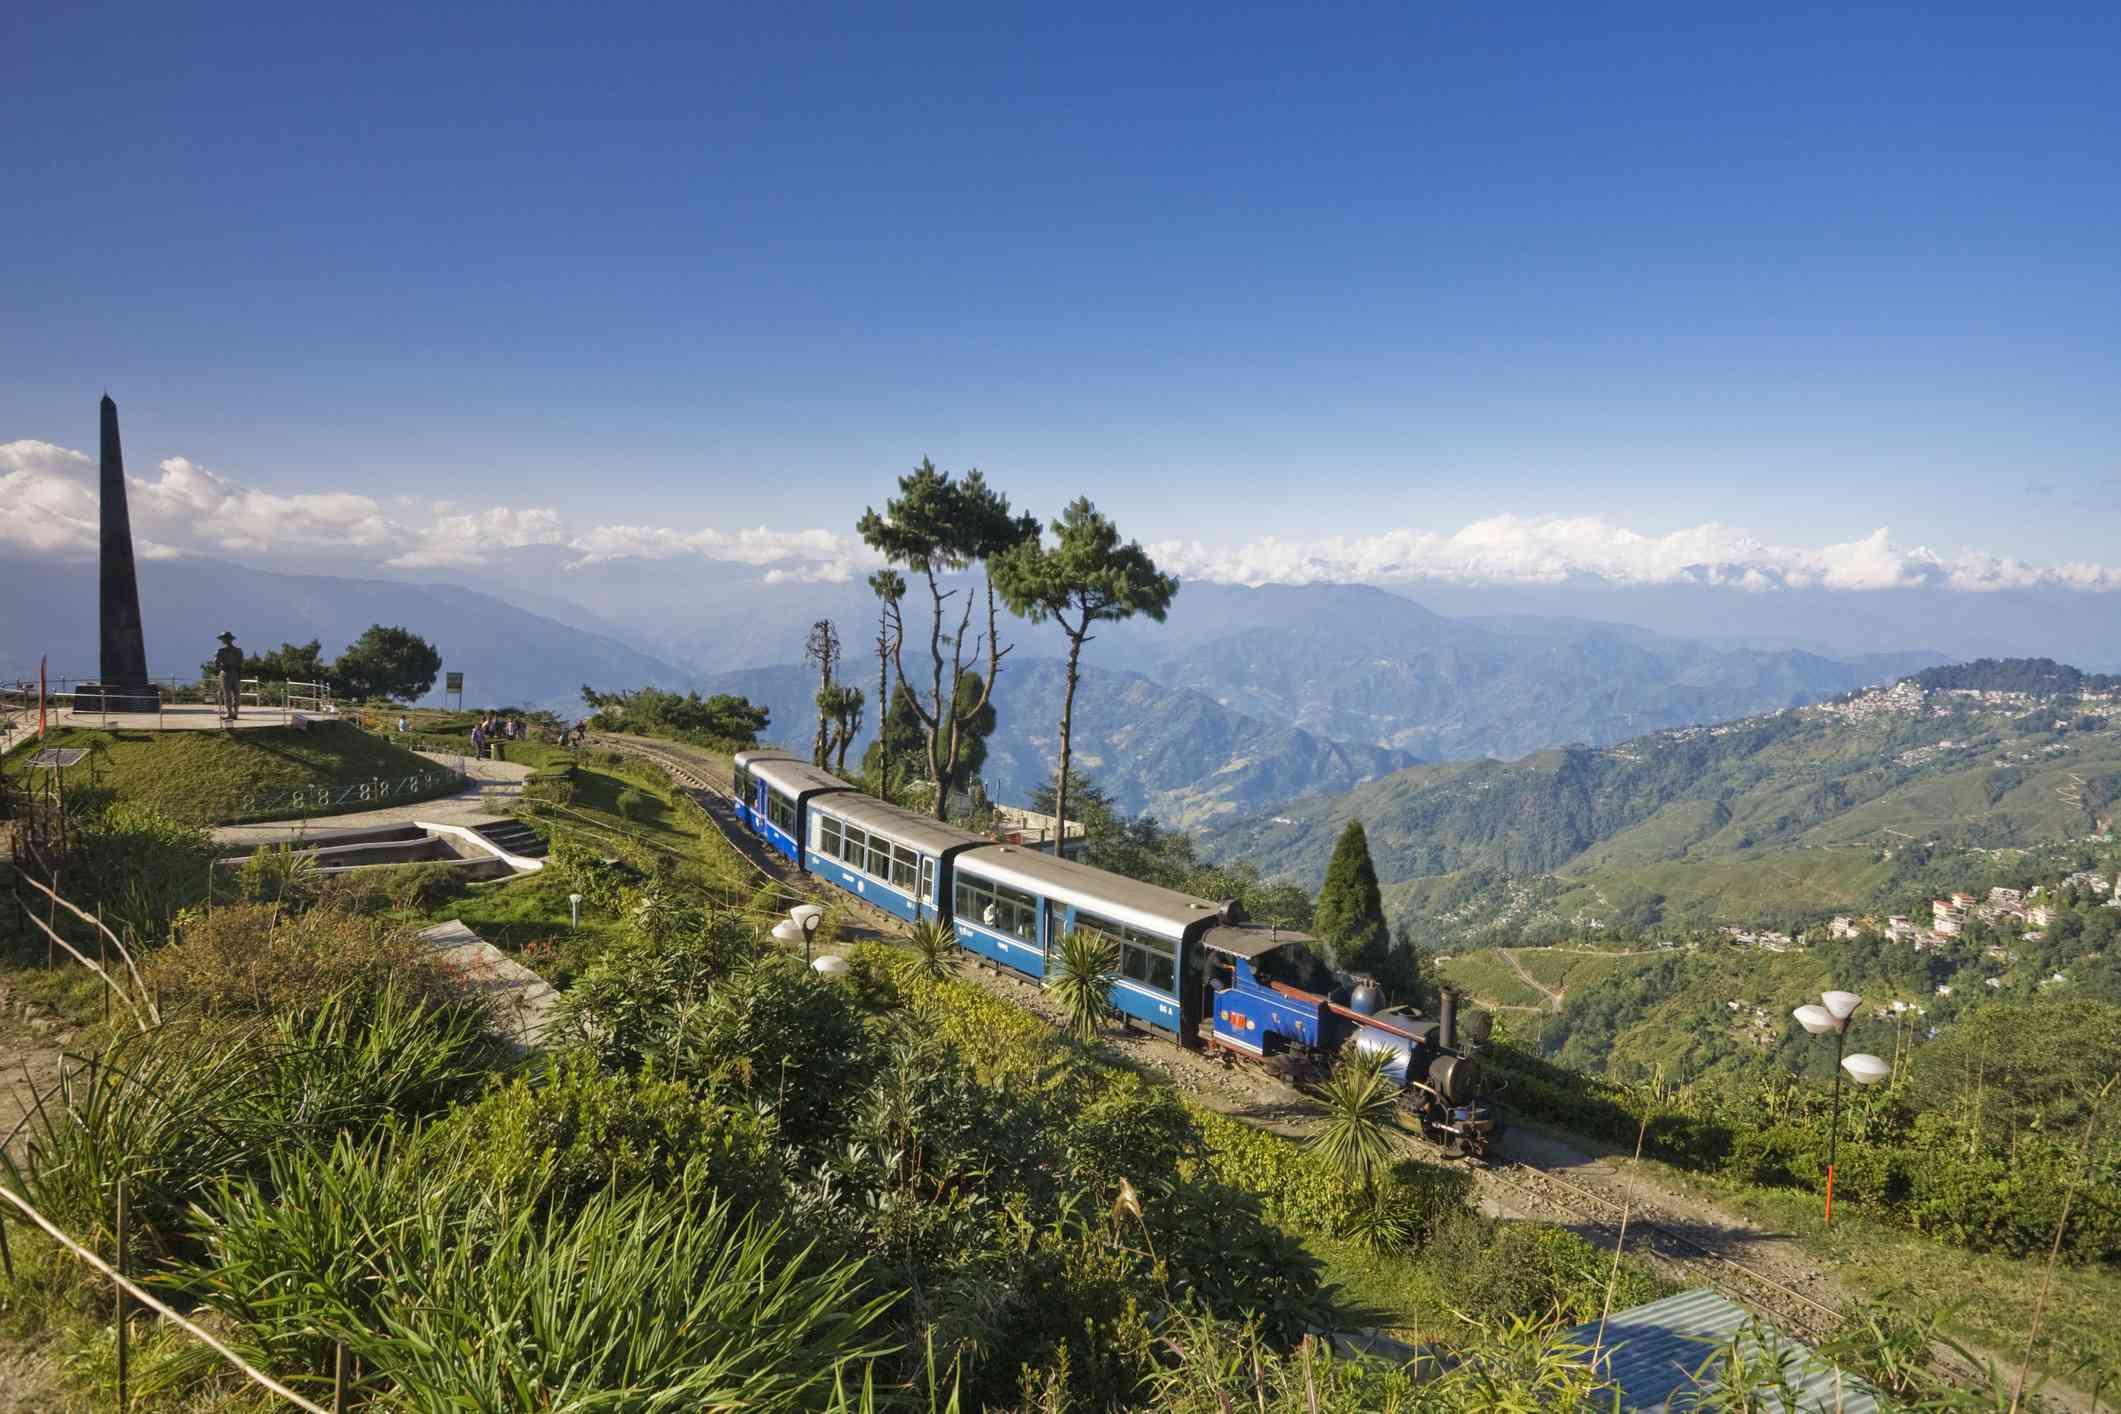 Batasia Loop, Steam Toy Train of the Darjeeling Himalayan Railway.